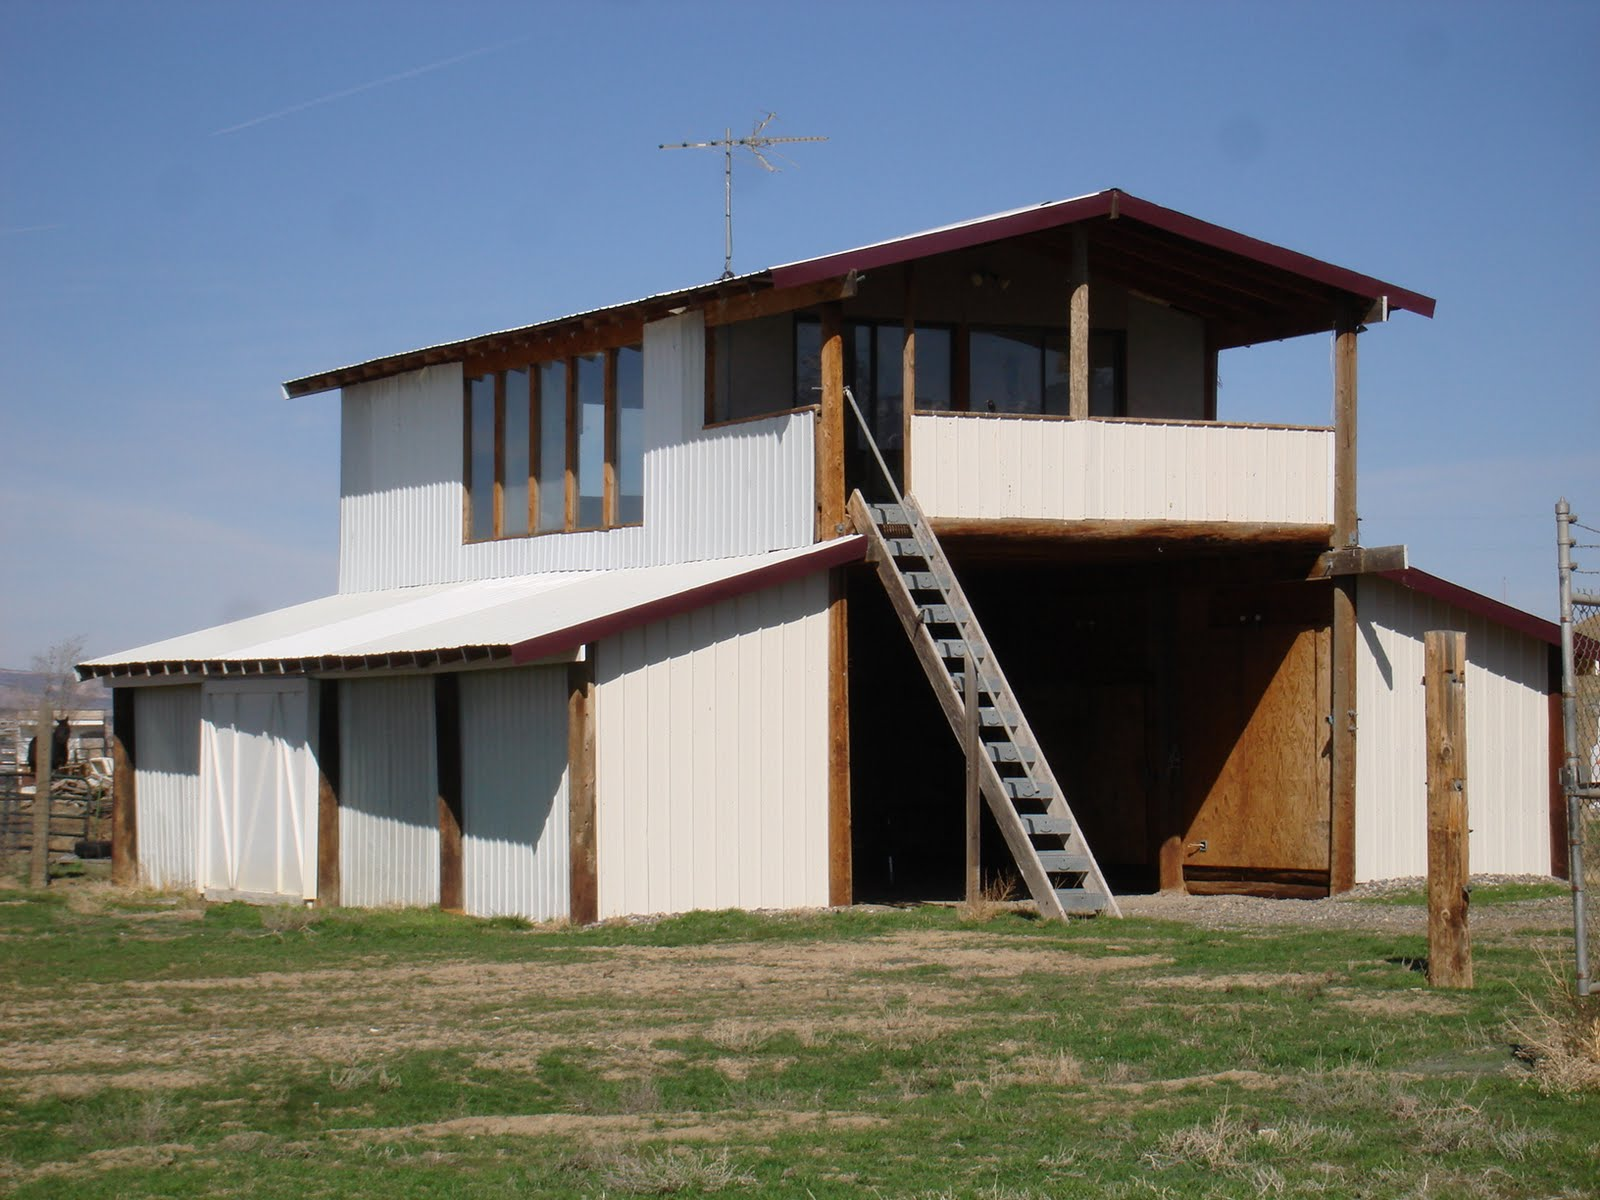 Passive Solar Home House For Sale 239 900 June 2010